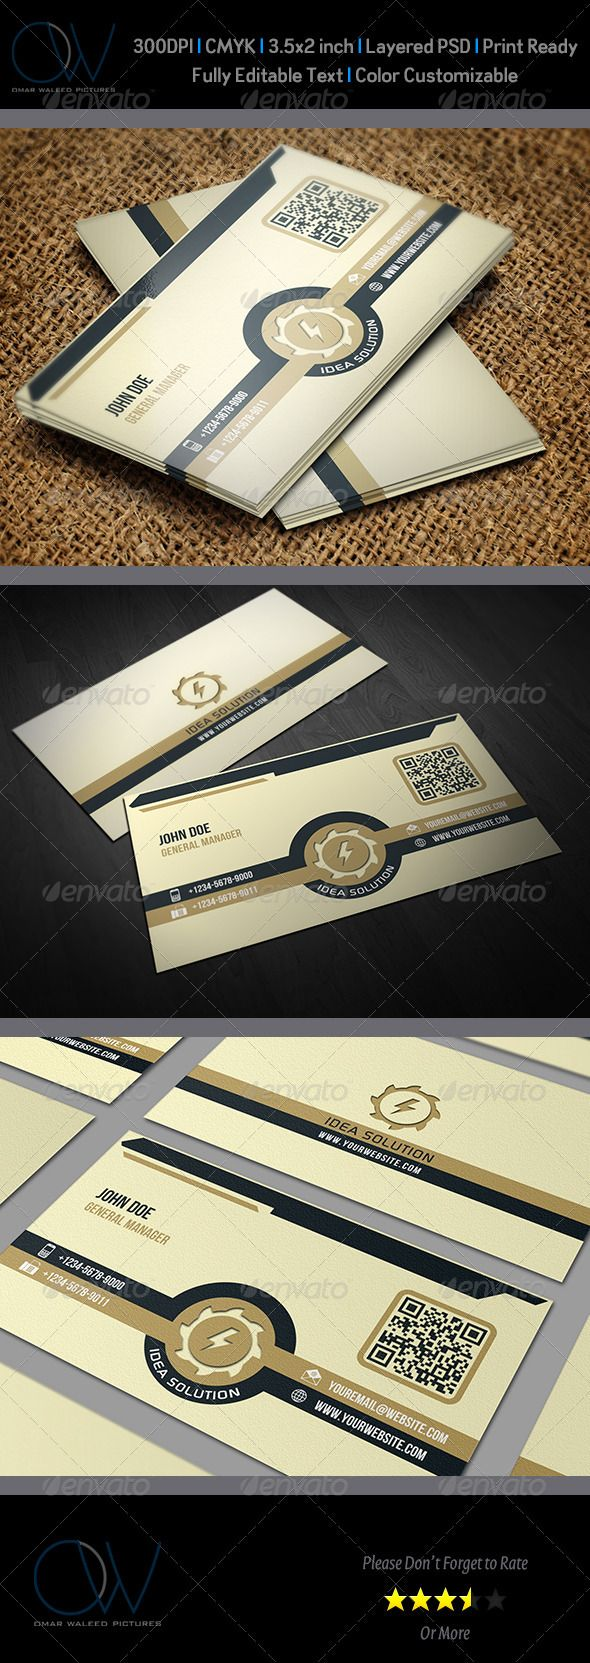 Corporate Business Card Vol.11